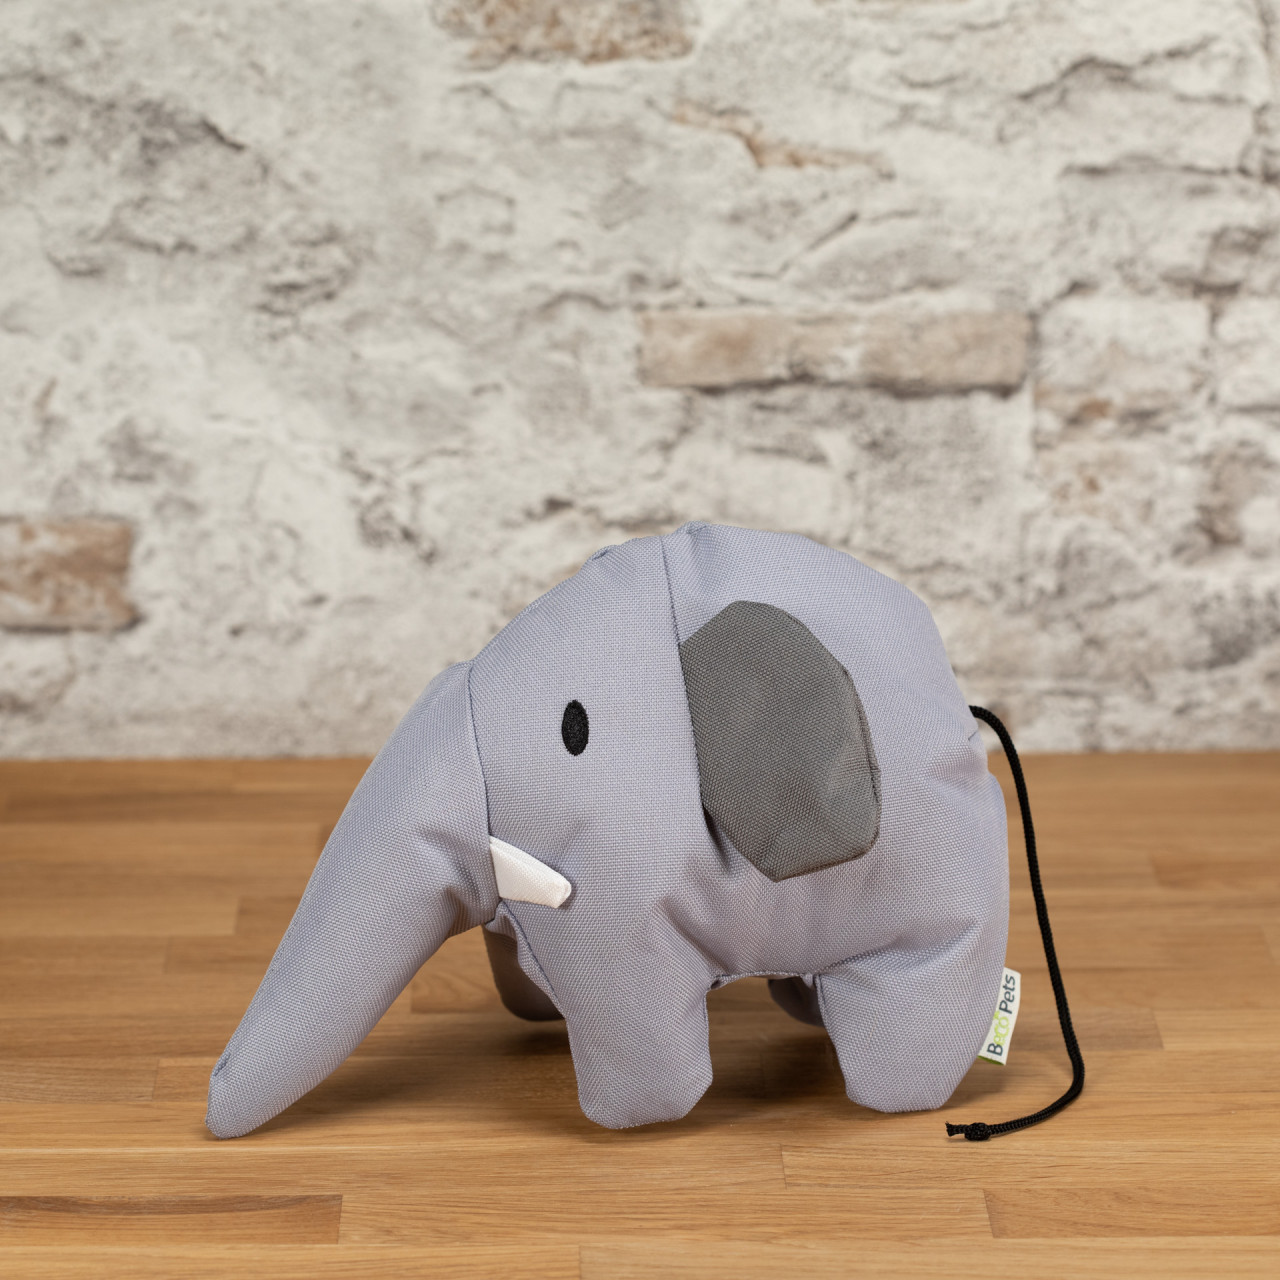 Hundespielzeug Estella, der Elefant